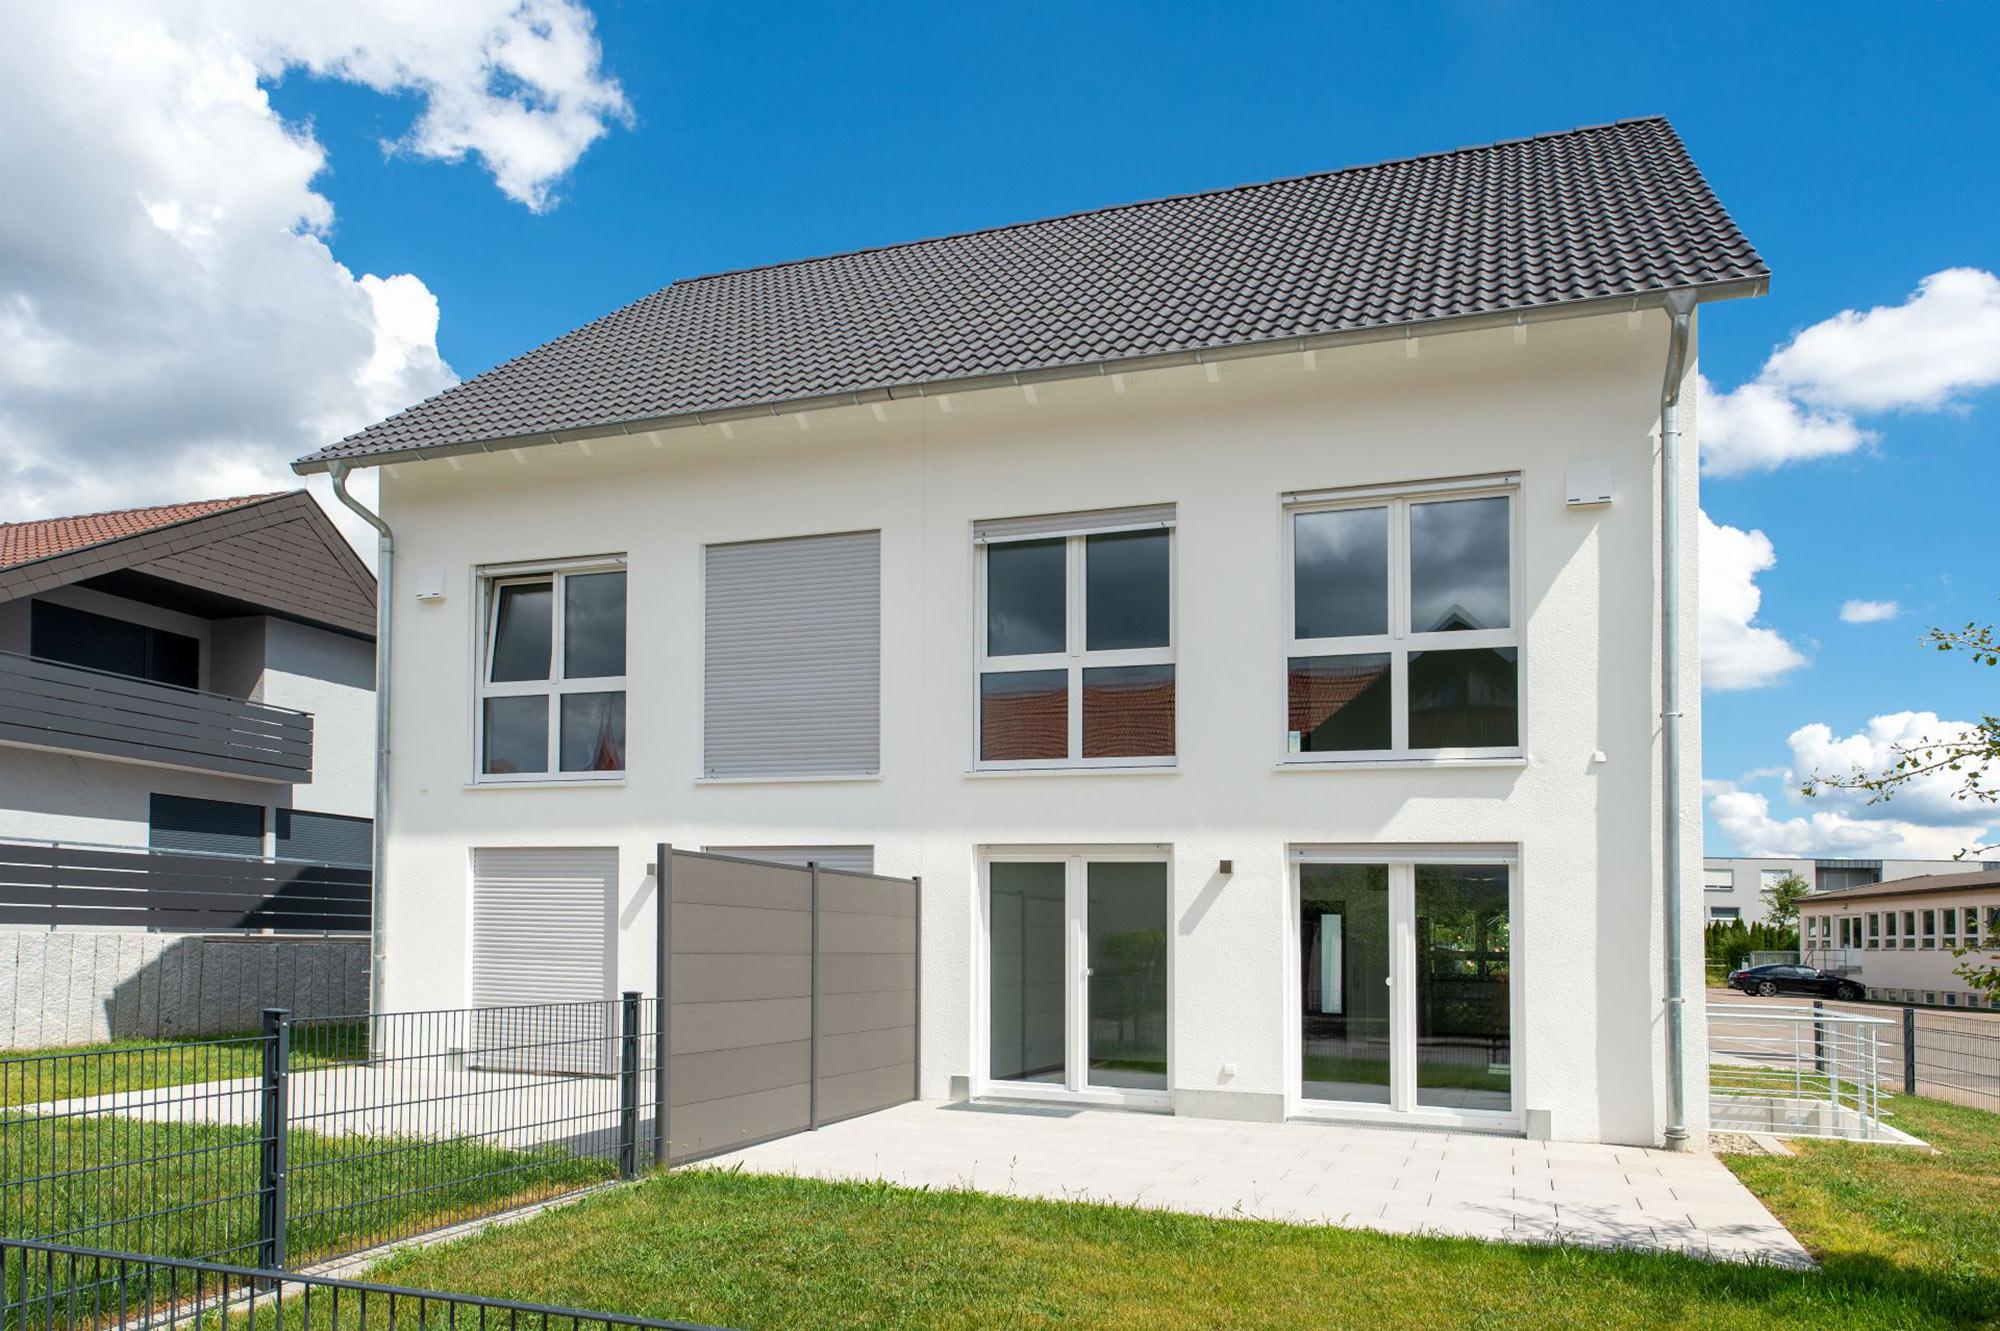 Günstig bauen in Holzgerlingen